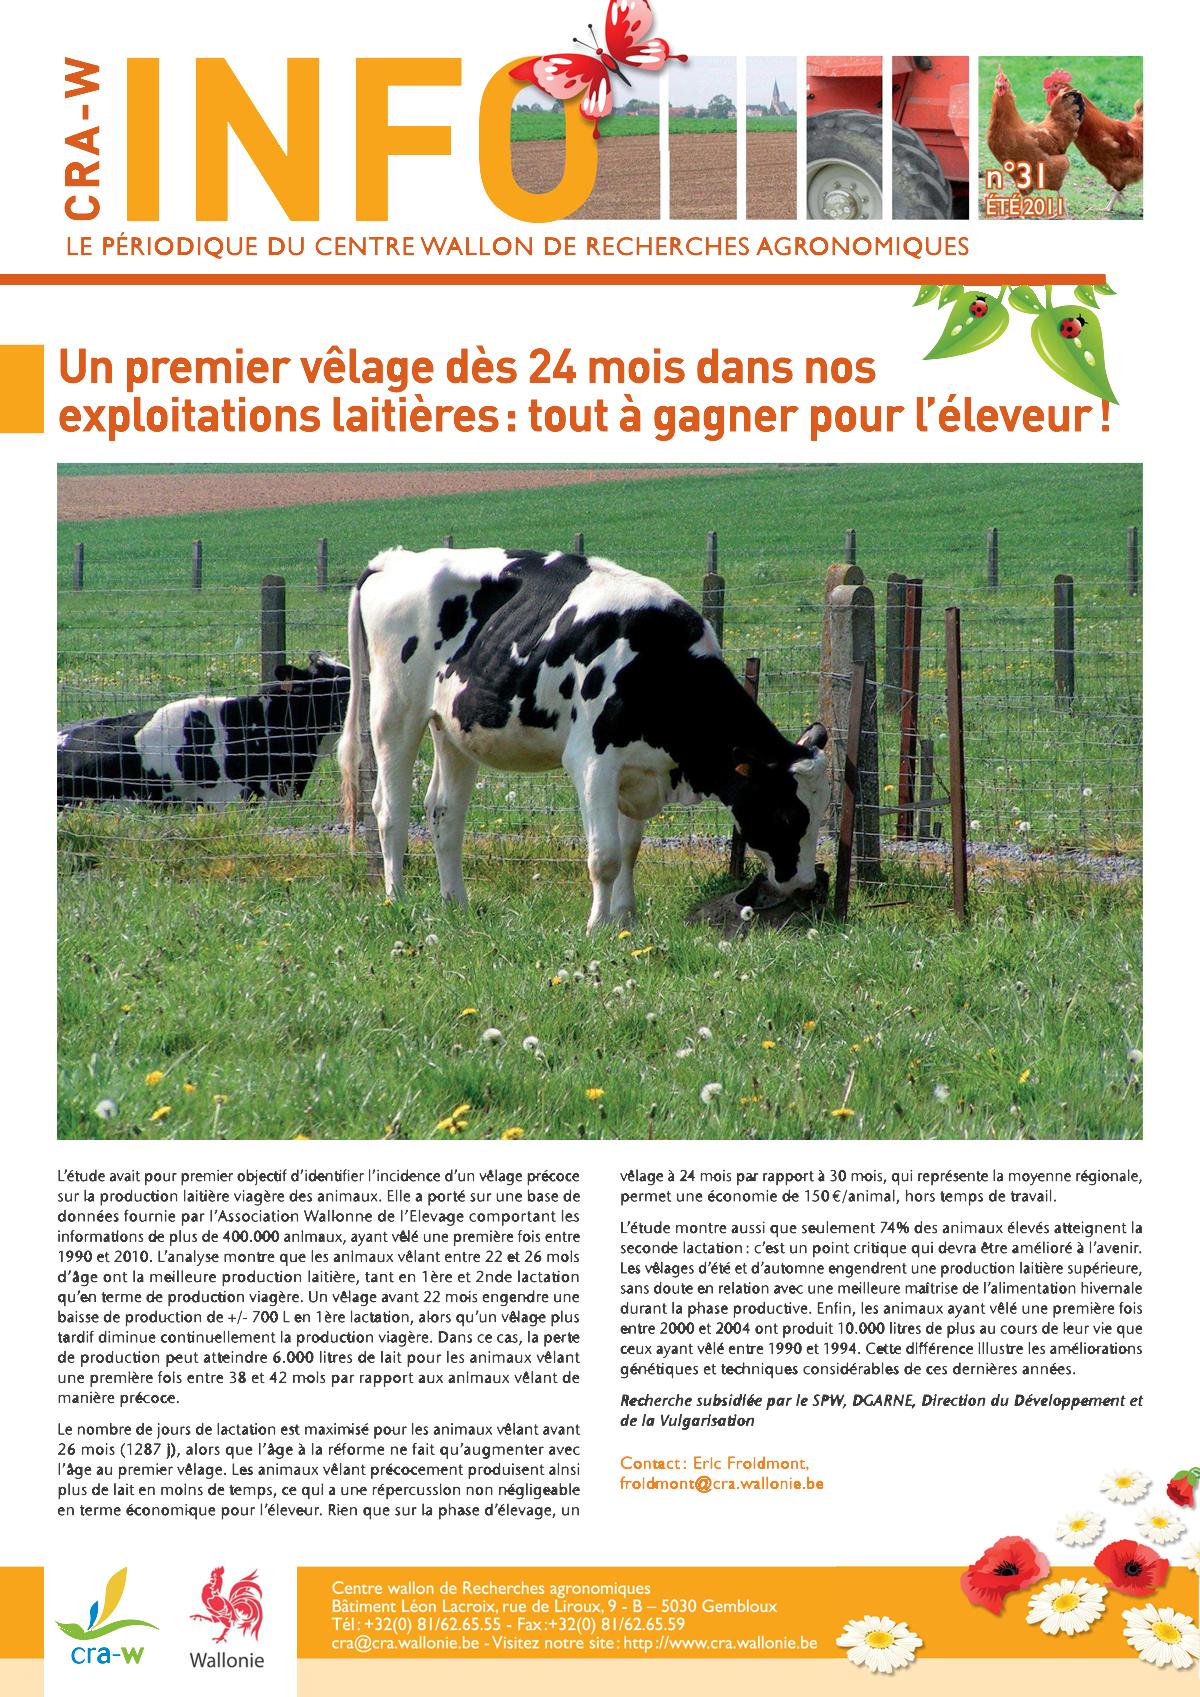 CRAW info n° 31